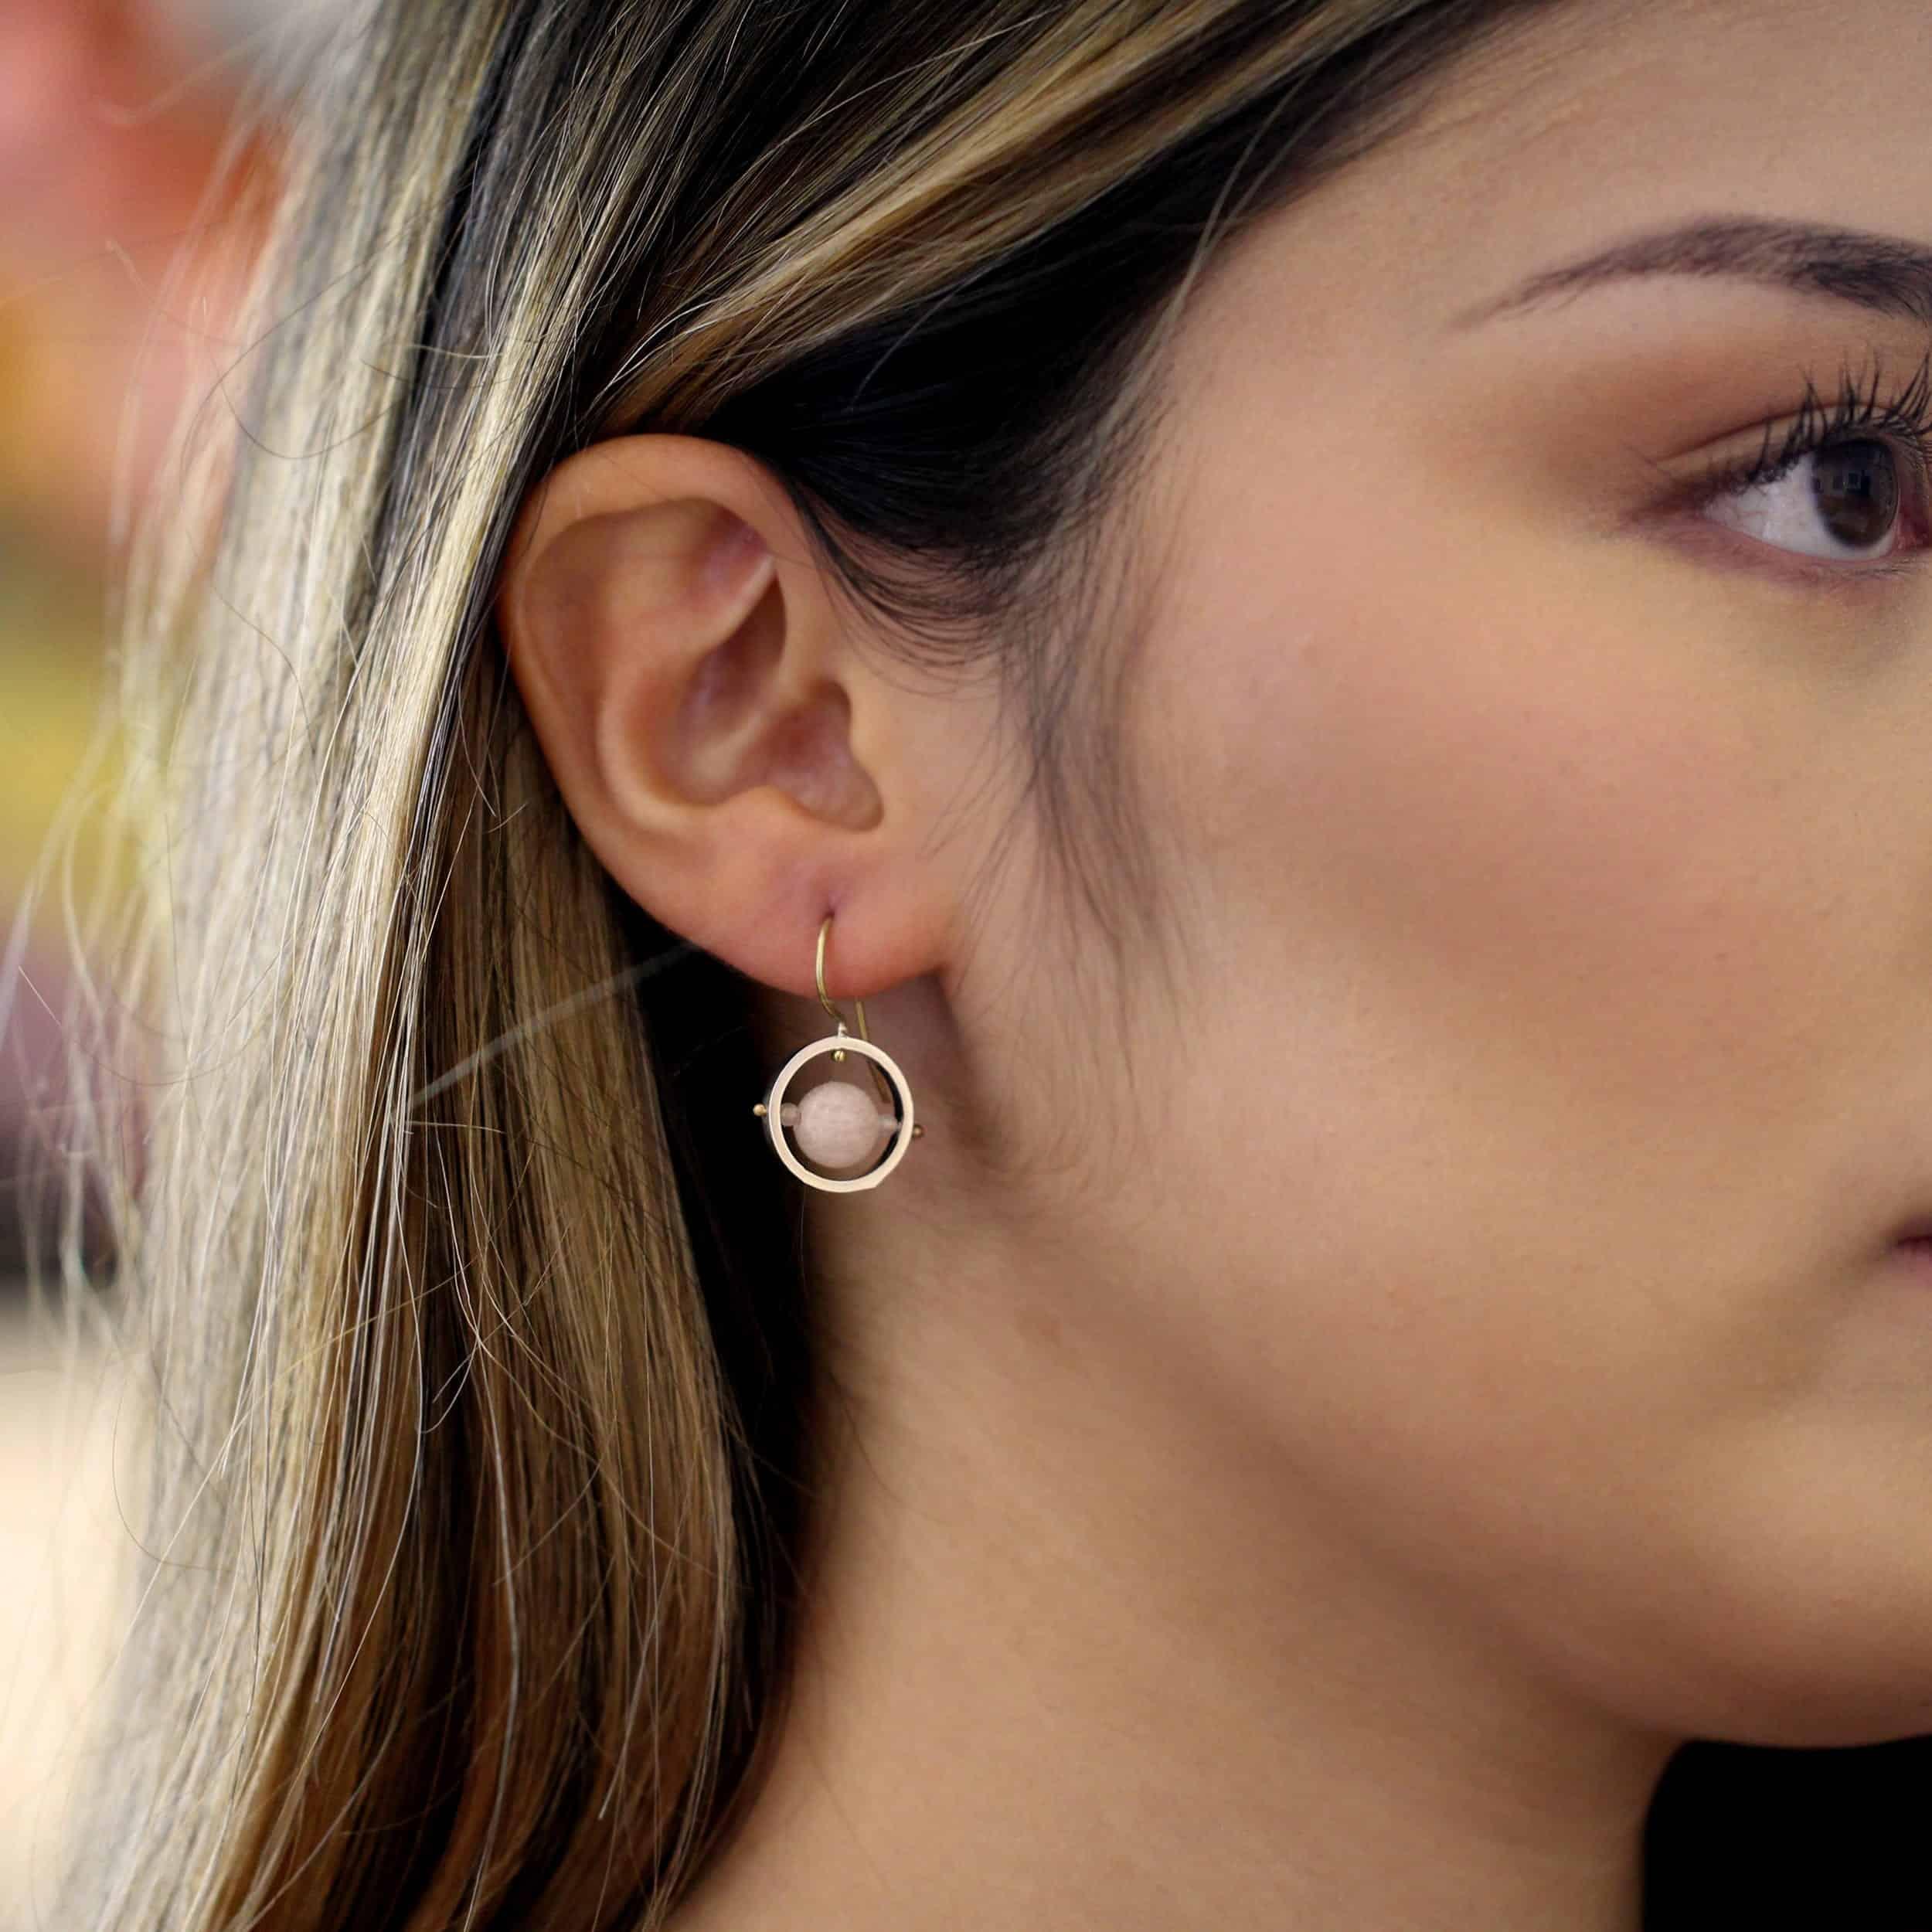 nicole van der wolf ice rink earrings morganite pink beryl designyard contemporary jewellery gallery dublin ireland